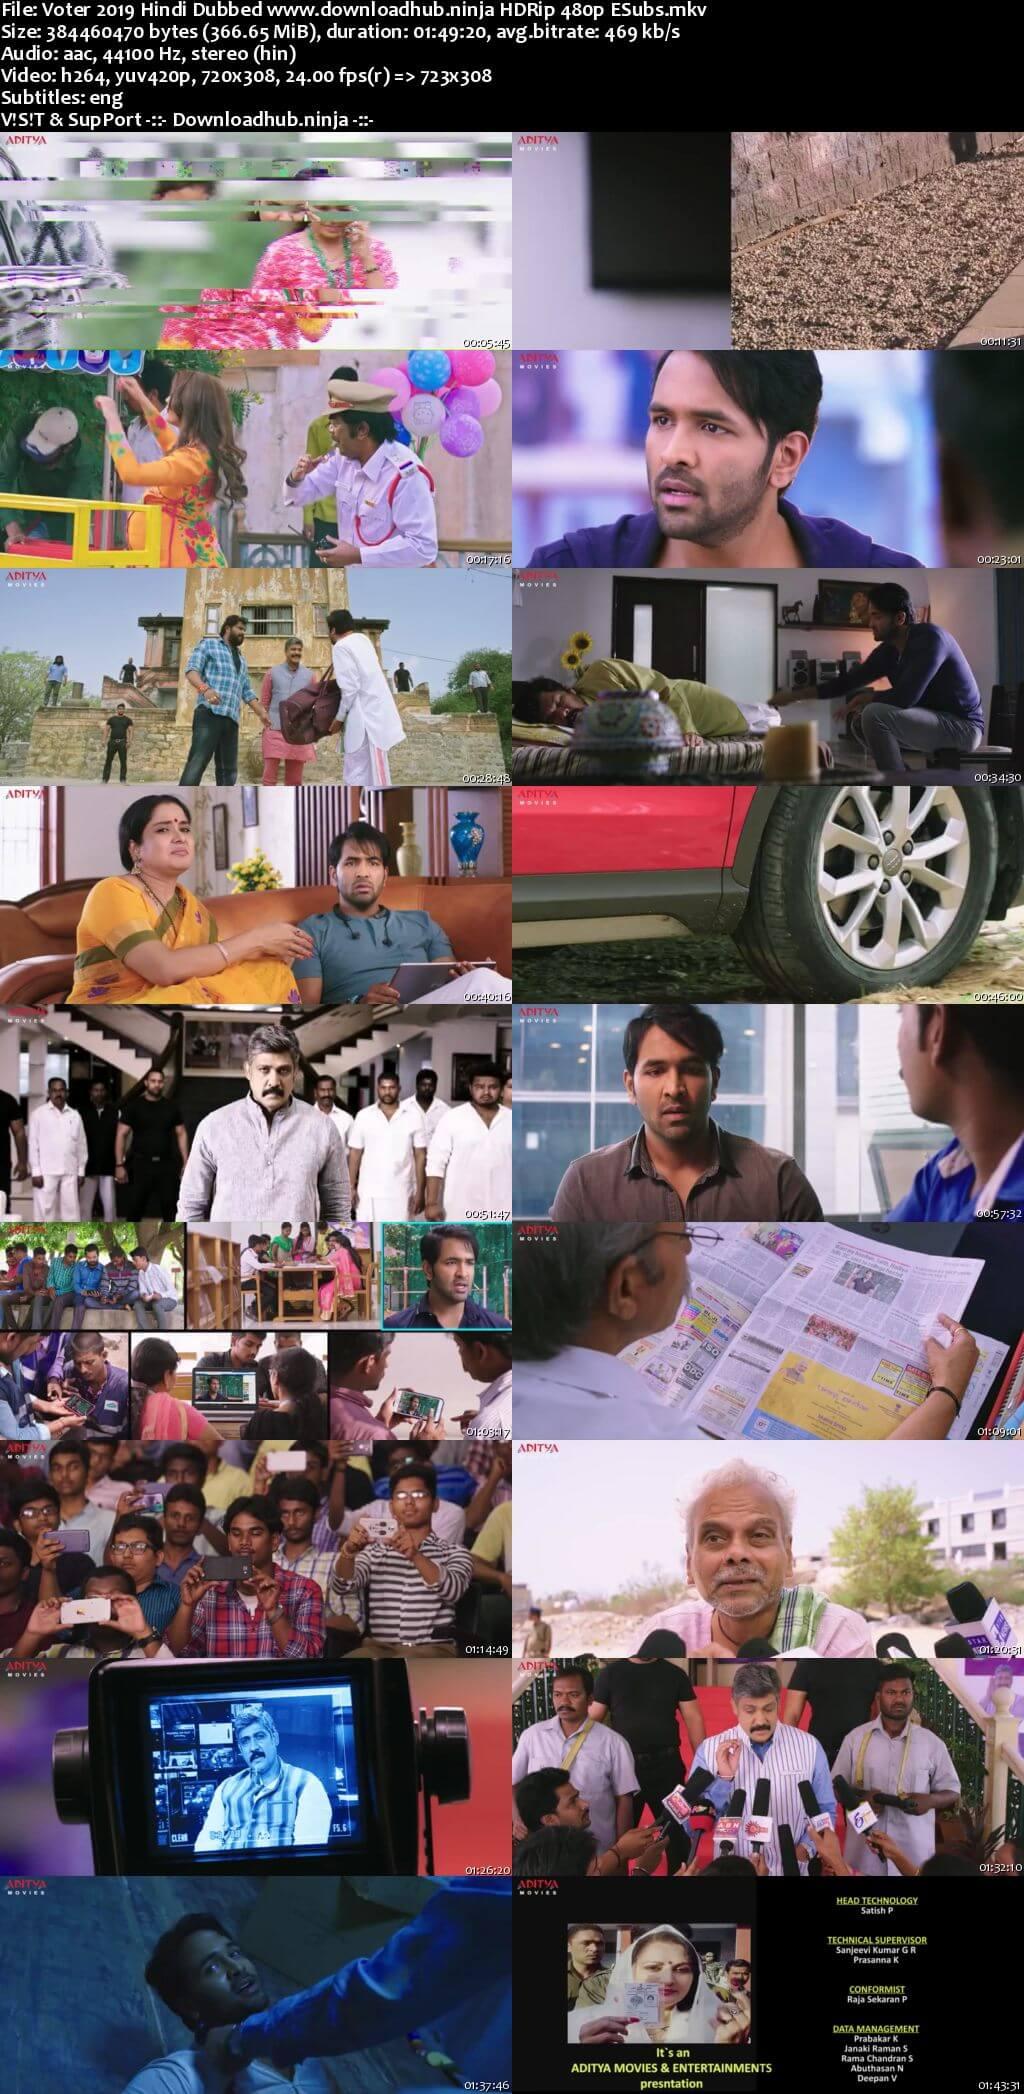 Voter 2019 Hindi Dubbed 350MB HDRip 480p ESubs